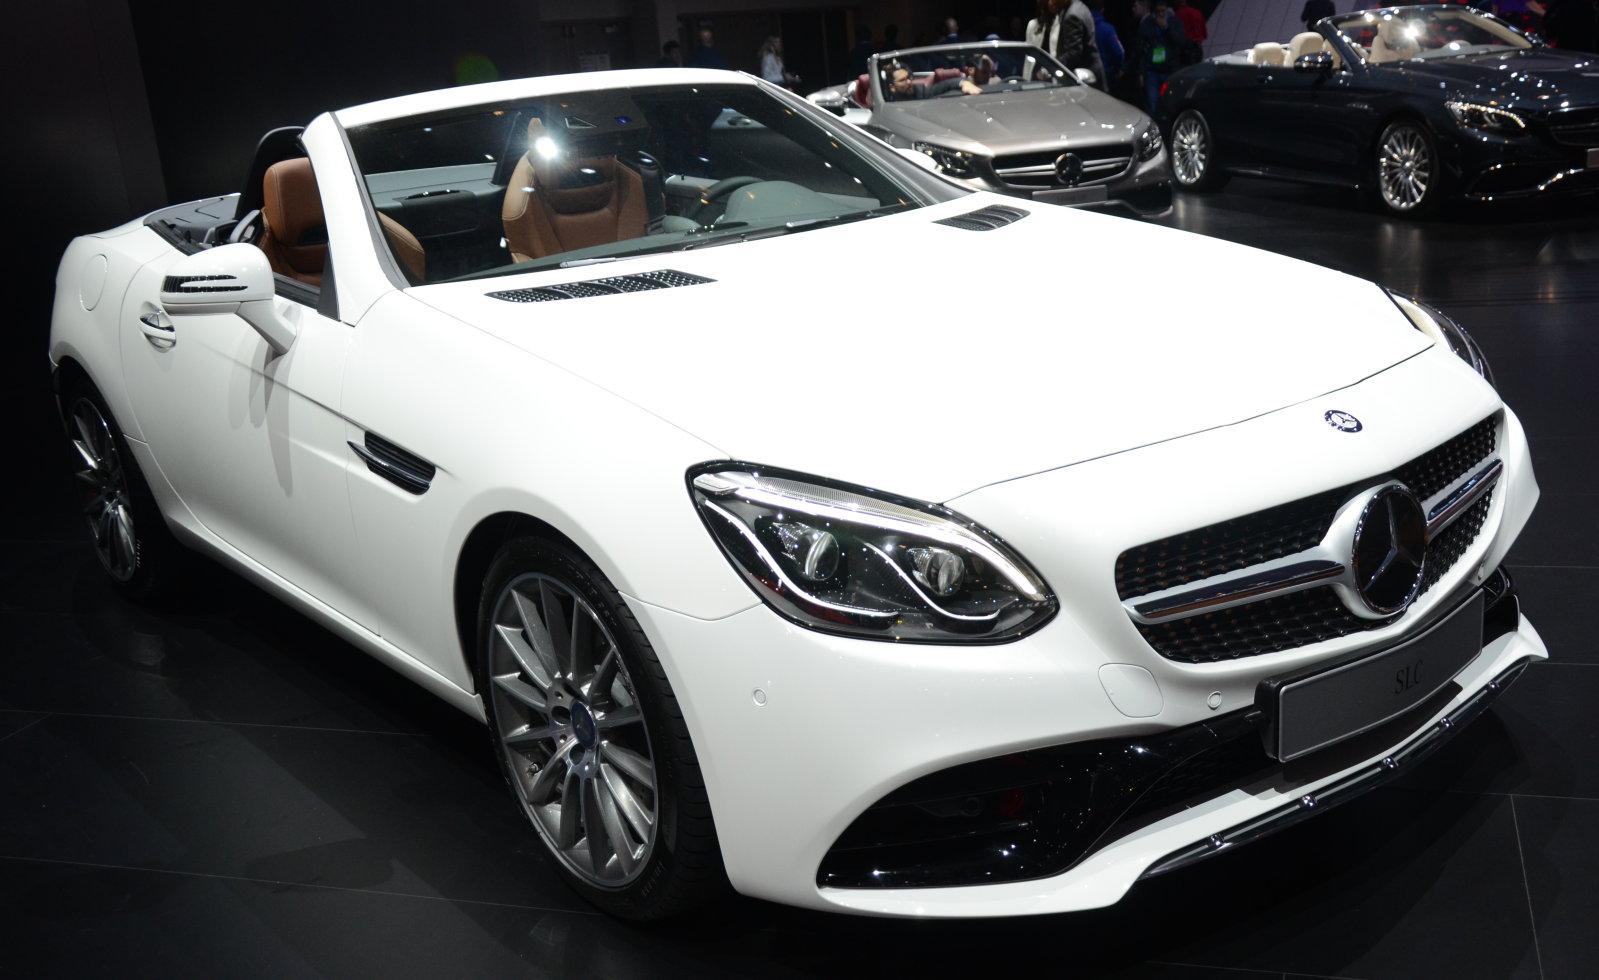 Mercedes Cars At Auto Expo 2016 Mercedes Benz At Delhi: Mercedes-Benz At 2016 Detroit Auto Show (20)